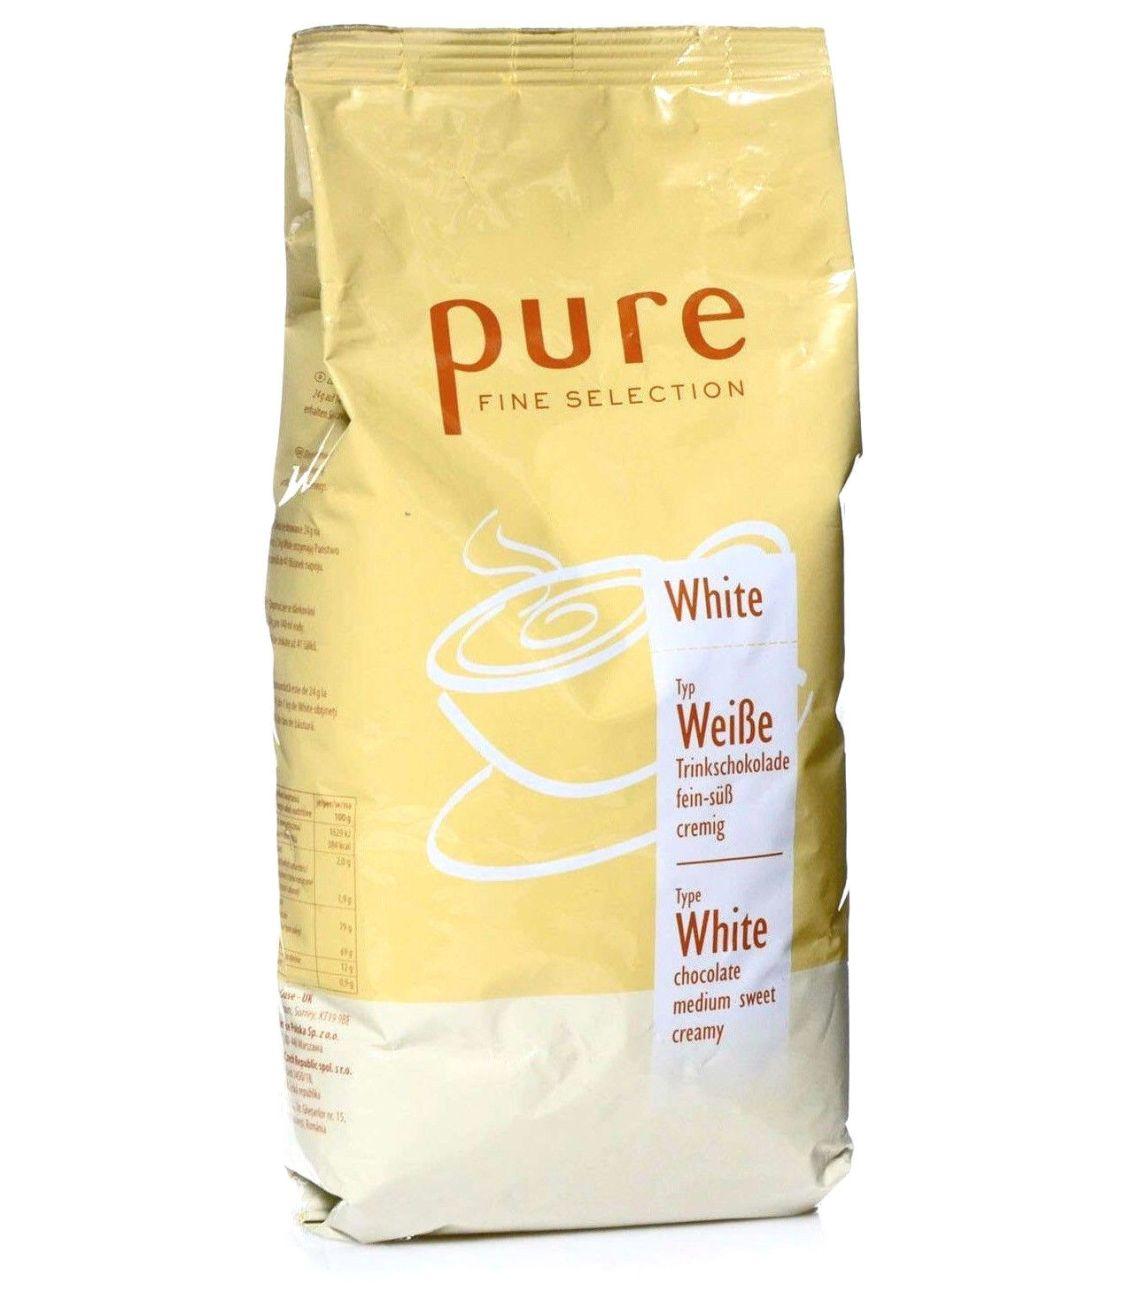 Tchibo Pure Fine Selection Kakao white 1Kg Weiße-Trinkschokolade